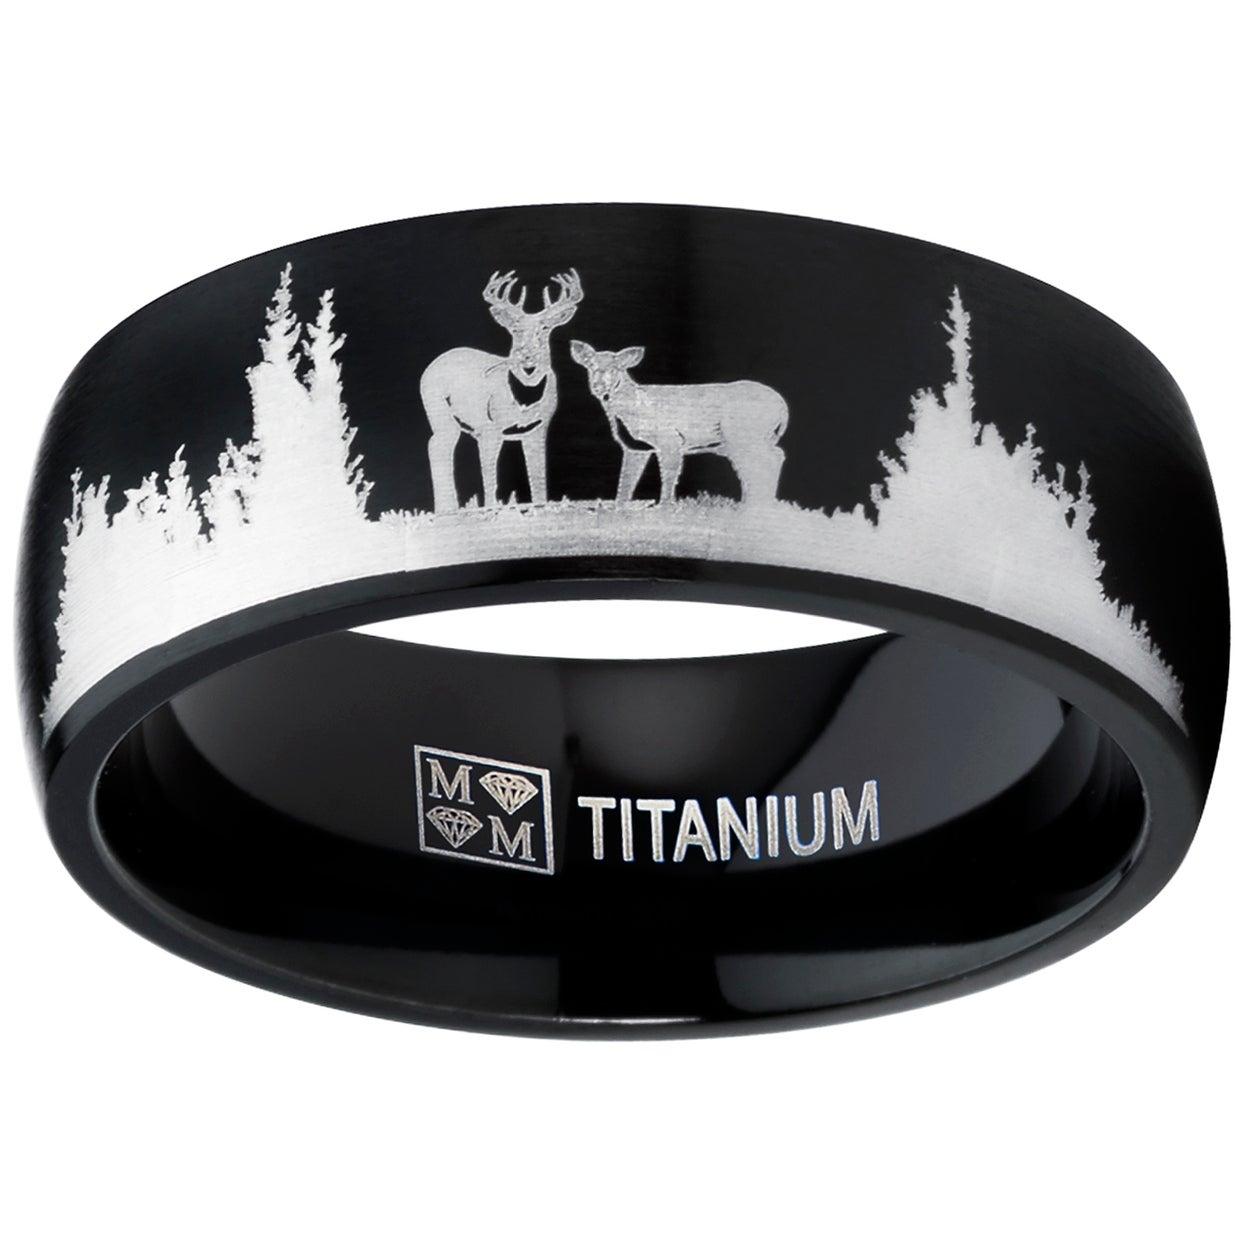 Oliveti Men's Black Outdoor Hunting Titanium Ring Band Laser Etched Deer  Stag Scene - Overstock - 17447999